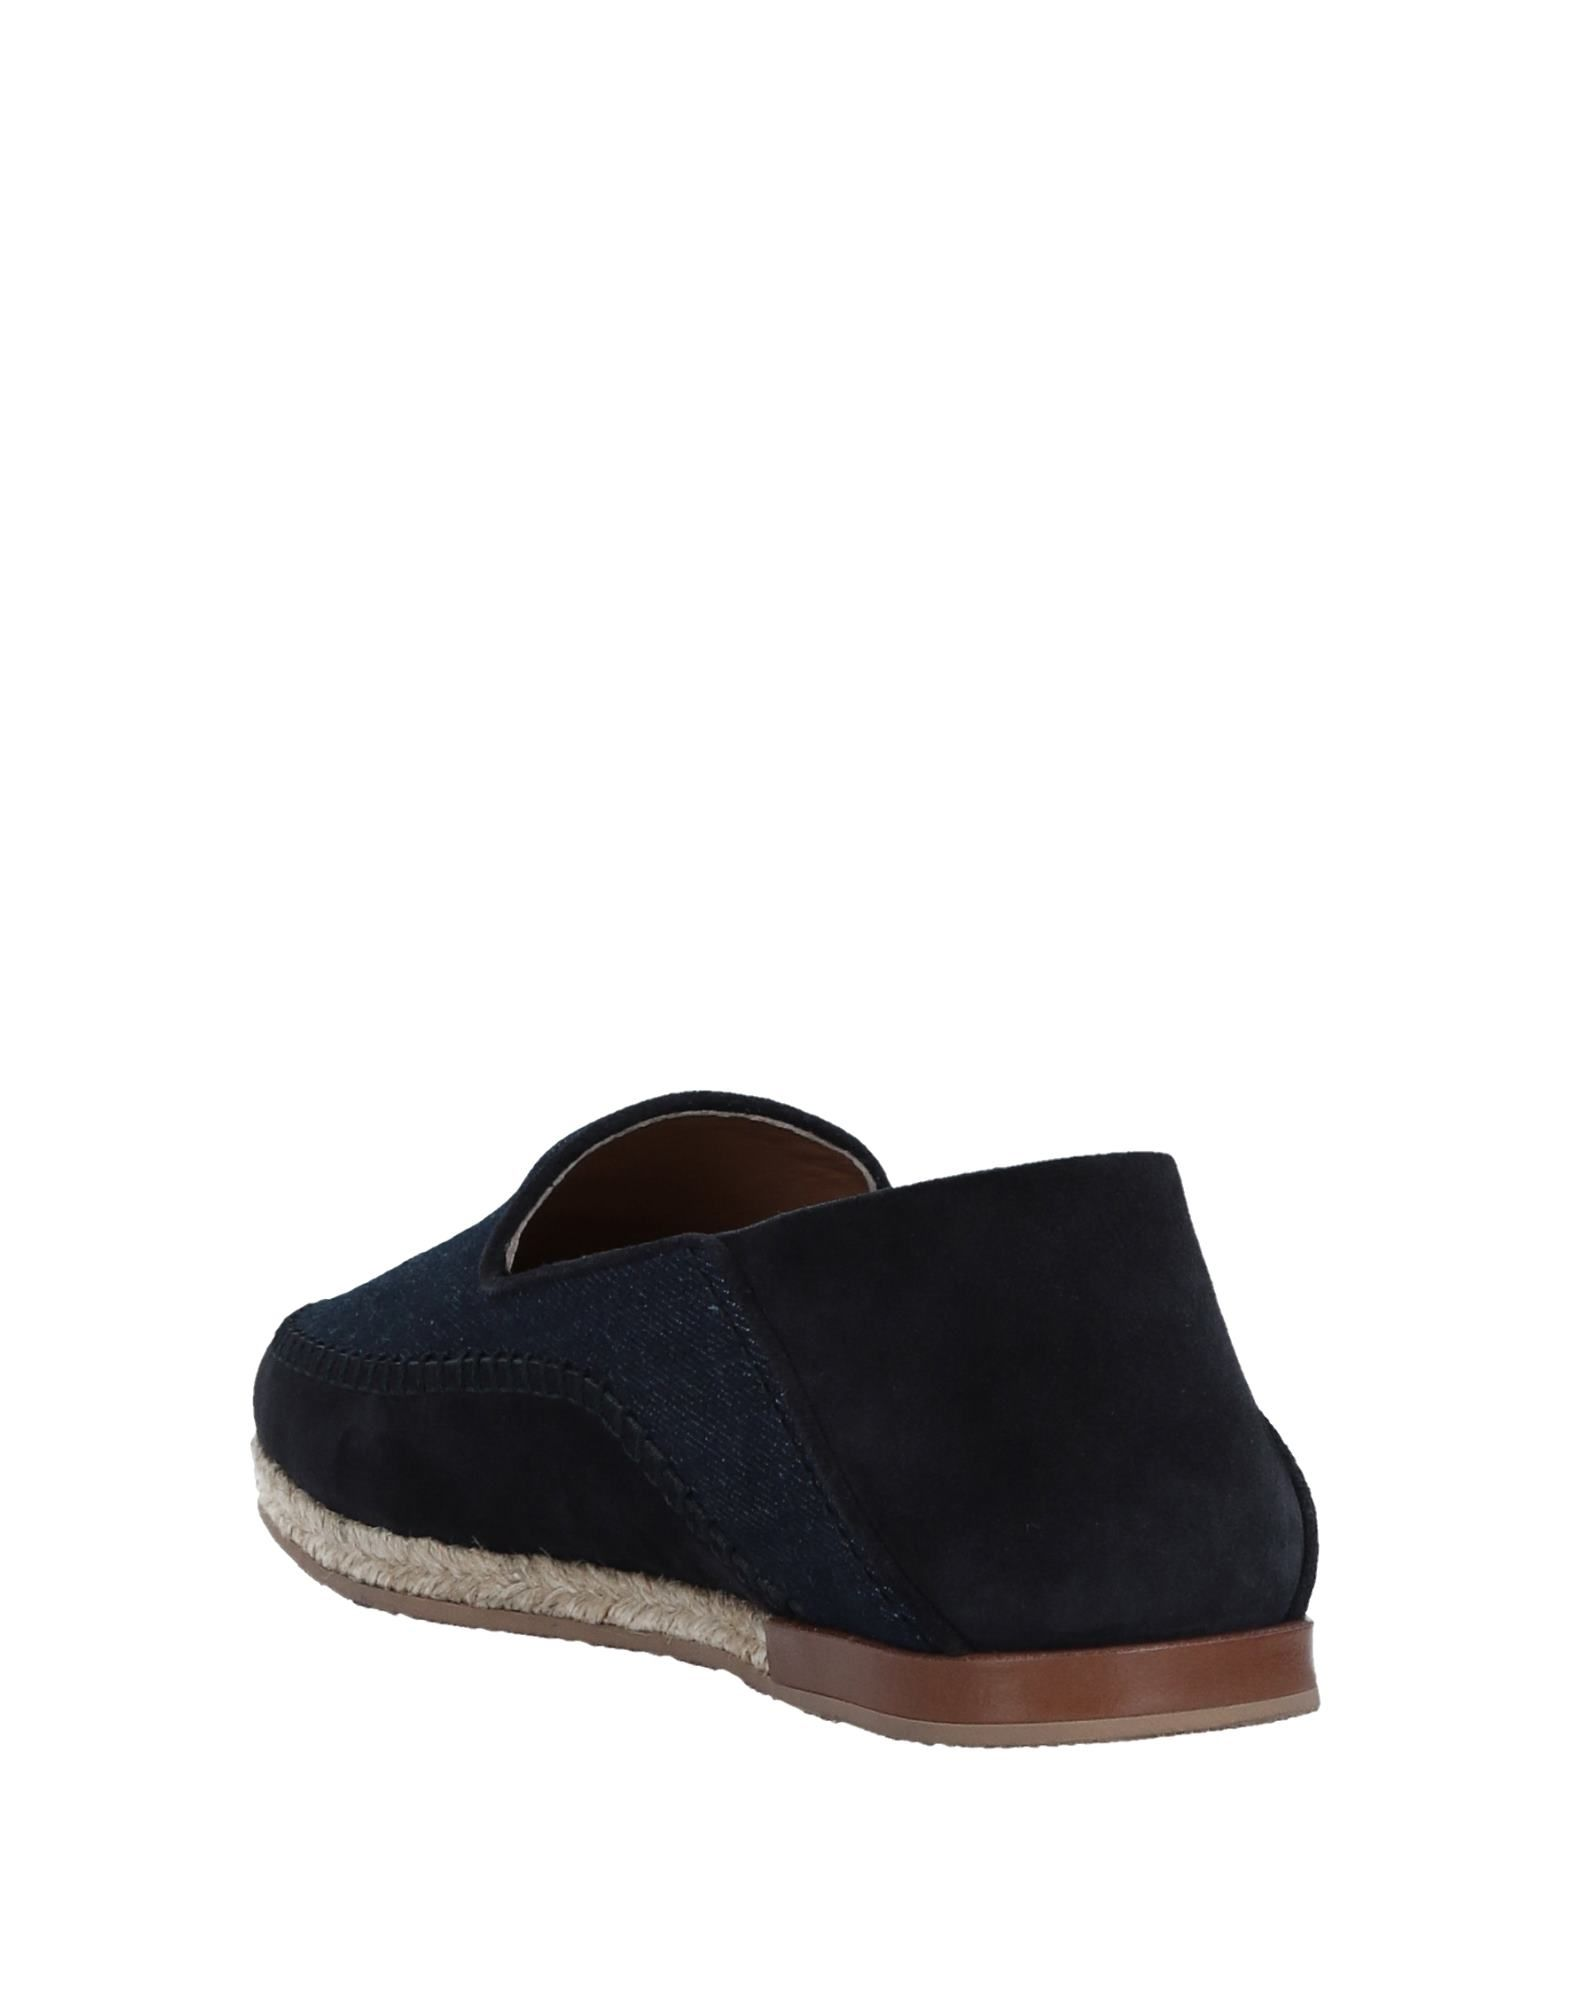 Ermenegildo Zegna Mokassins Herren  11518785NV Gute Qualität beliebte Schuhe